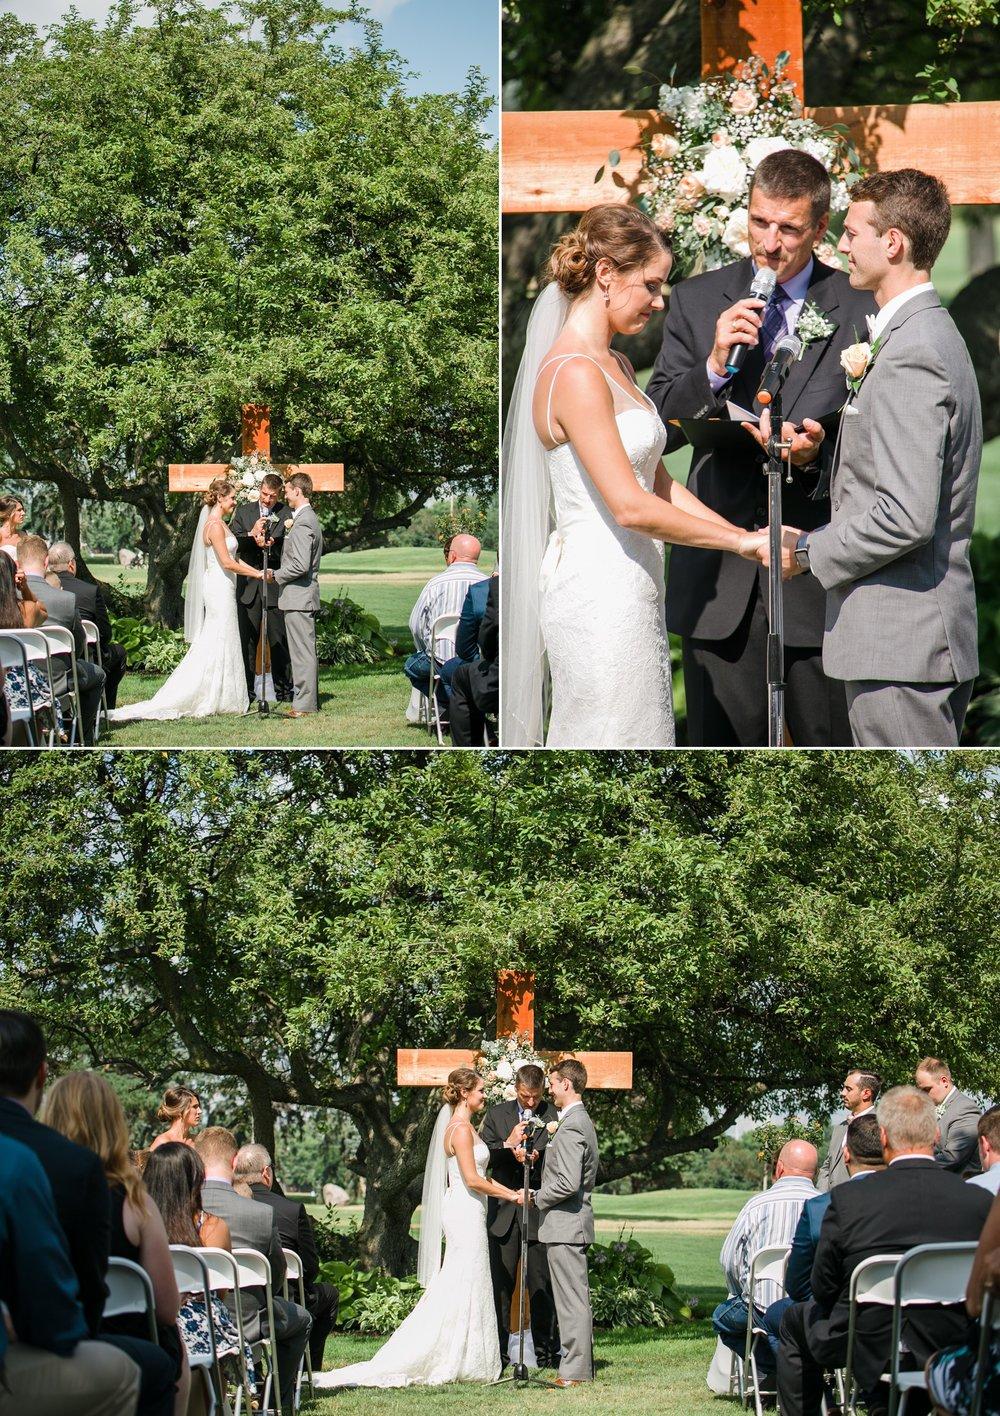 Highland-meadows-wedding-photos 12.jpg